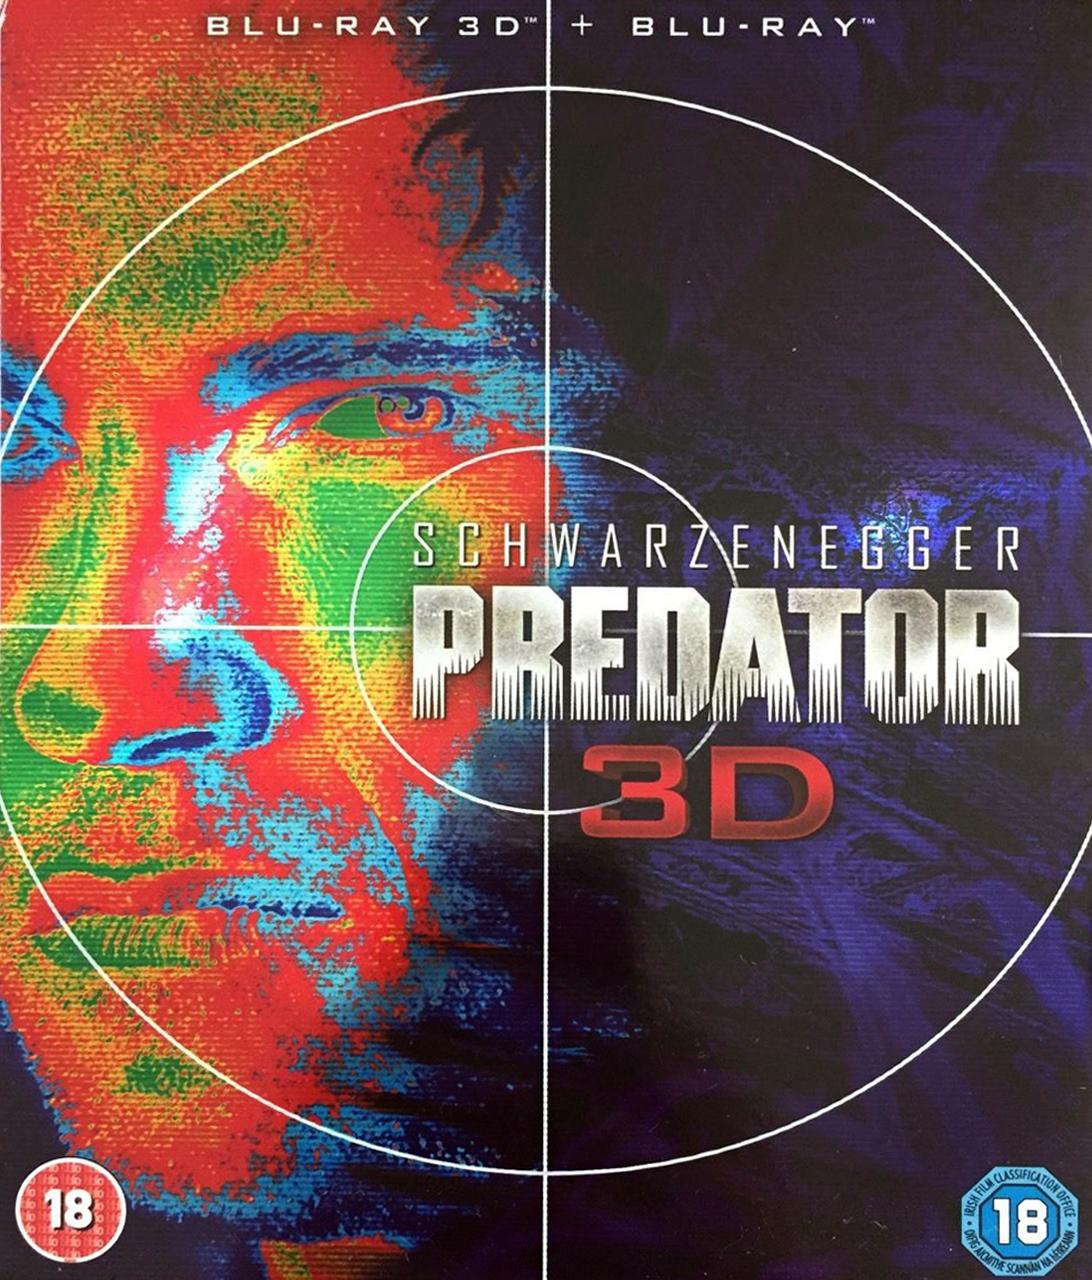 Predator 3D Blu-Ray Slipcase Front [UK] (2013) Predator DVDs & Blu-Rays